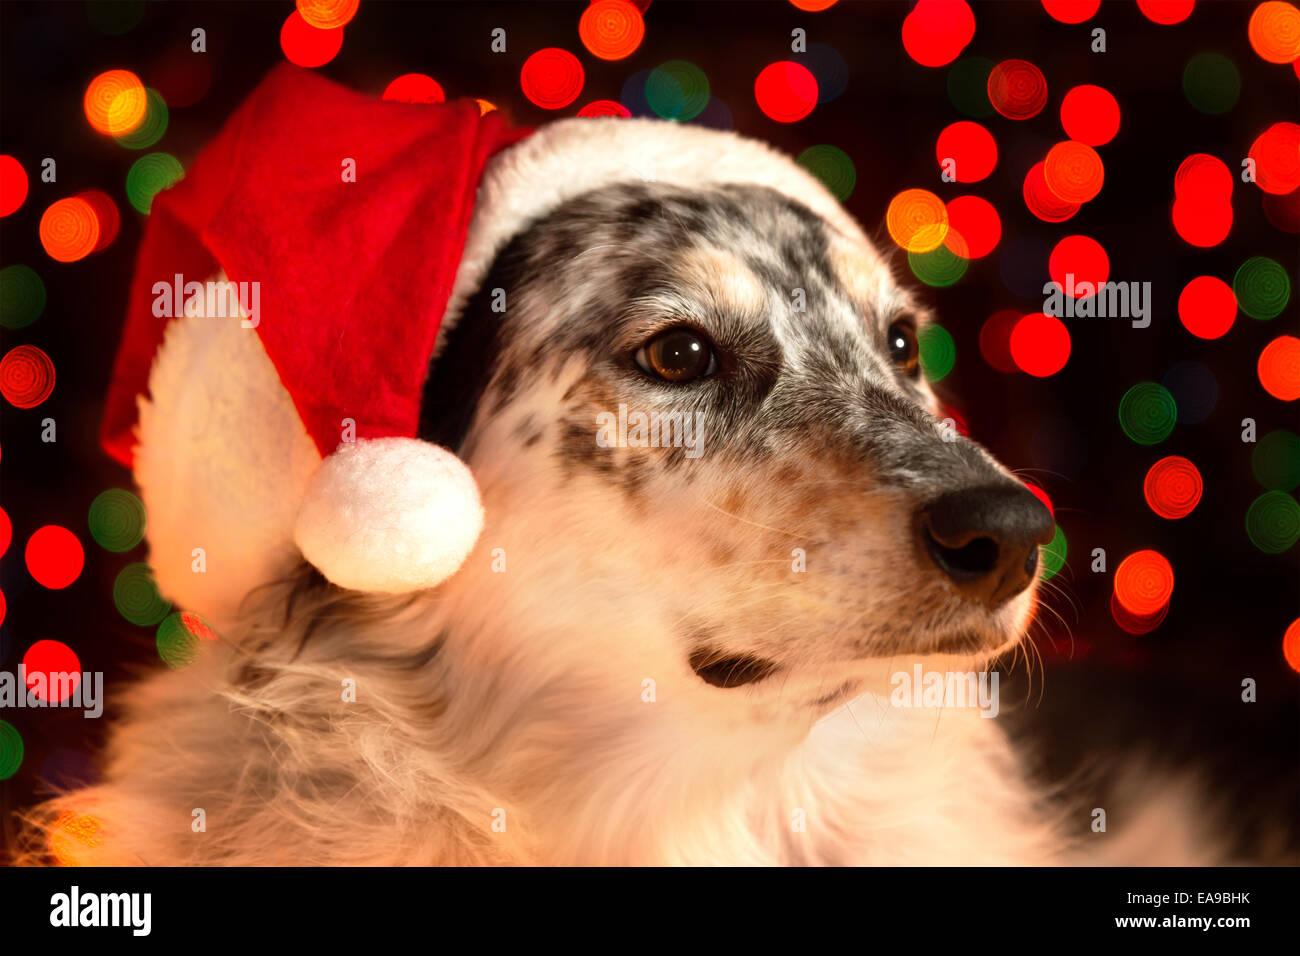 Border collie Australian shepherd mix dog closeup wearing santa hat with bokeh Christmas lights in background looking - Stock Image